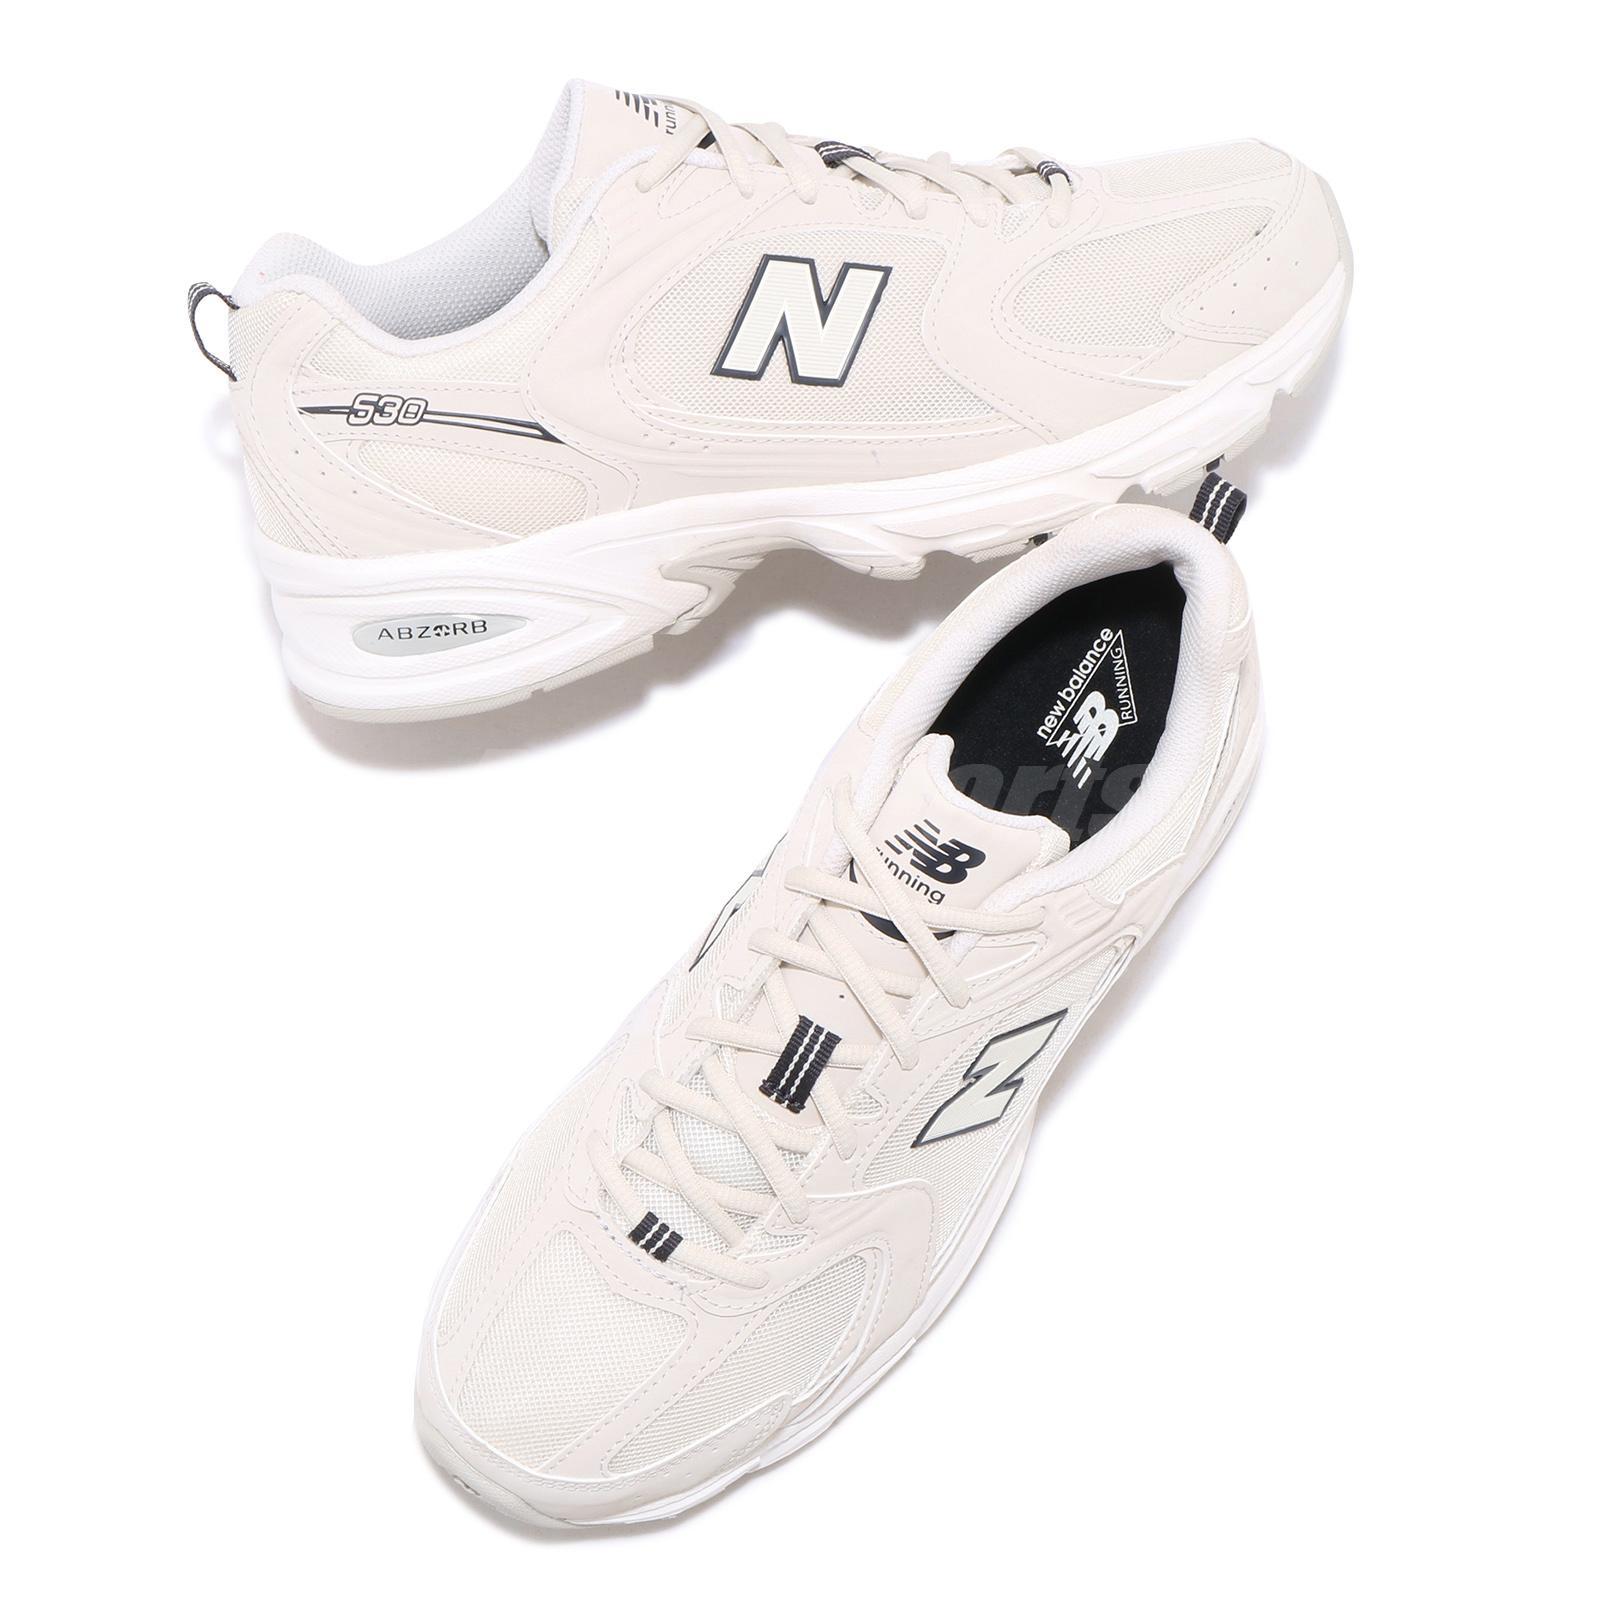 New Balance 530 V2 Retro Khaki ABZORB Men Women Classic Running Shoes MR530SH D